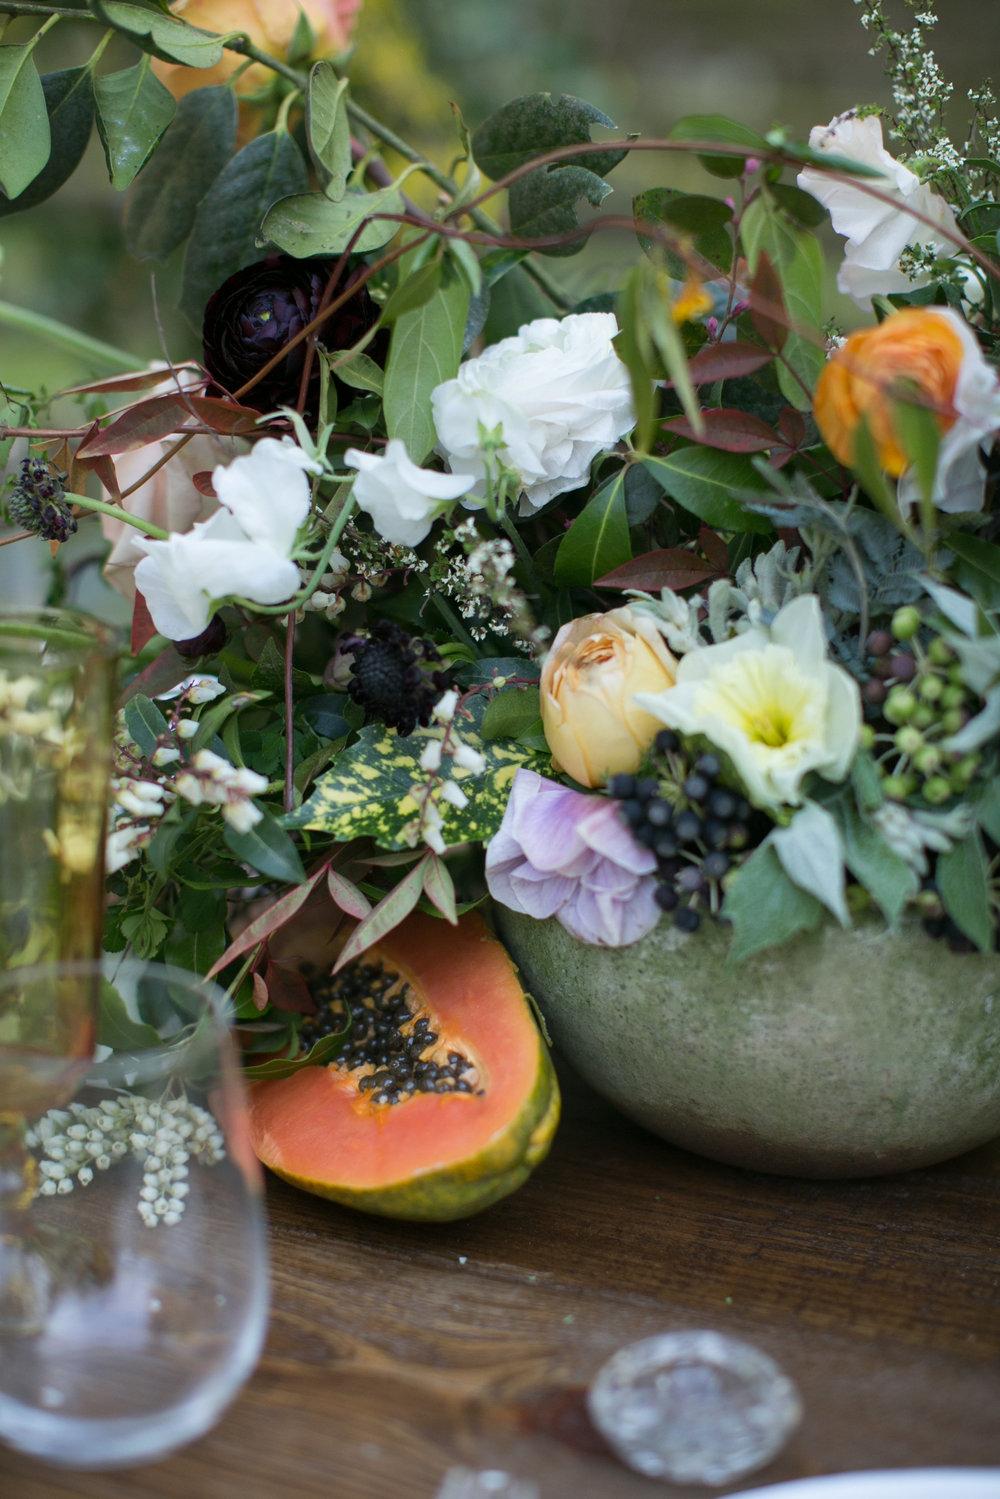 LaurenBalingitAmyOsabaatlantawedding-ivory-and-beau-savannah-wedding-florist-savannah-wedding-flowers.jpg